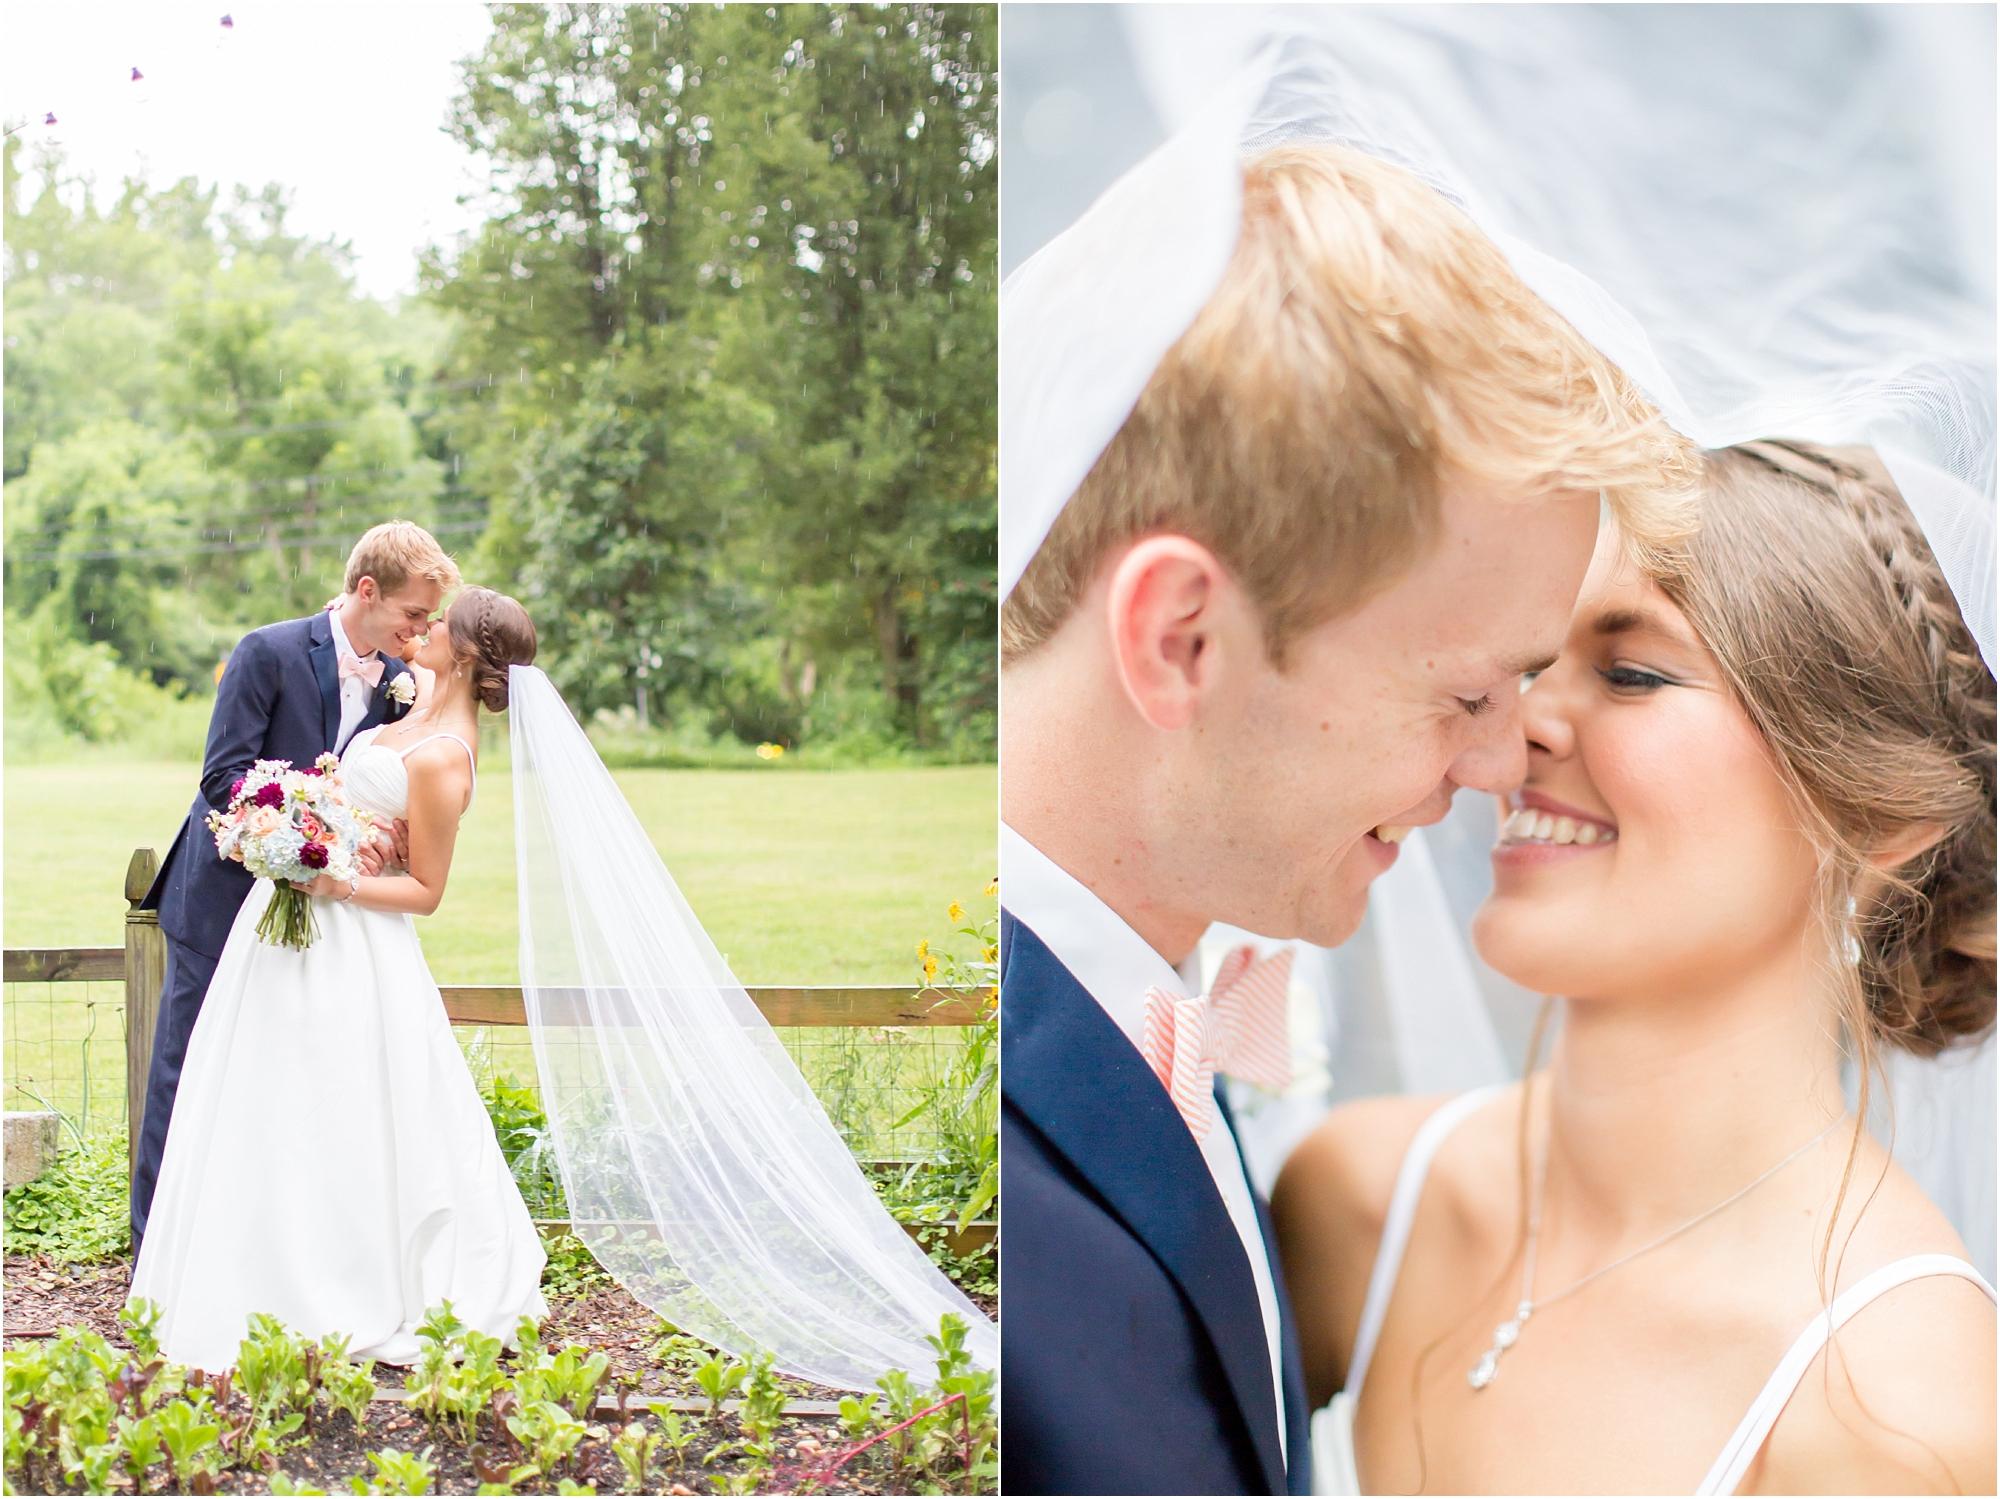 Russell 5-Bride & Groom Portraits-833_anna grace photography baltimore maryland wedding photographer elkridge furnace inn wedding photo.jpg